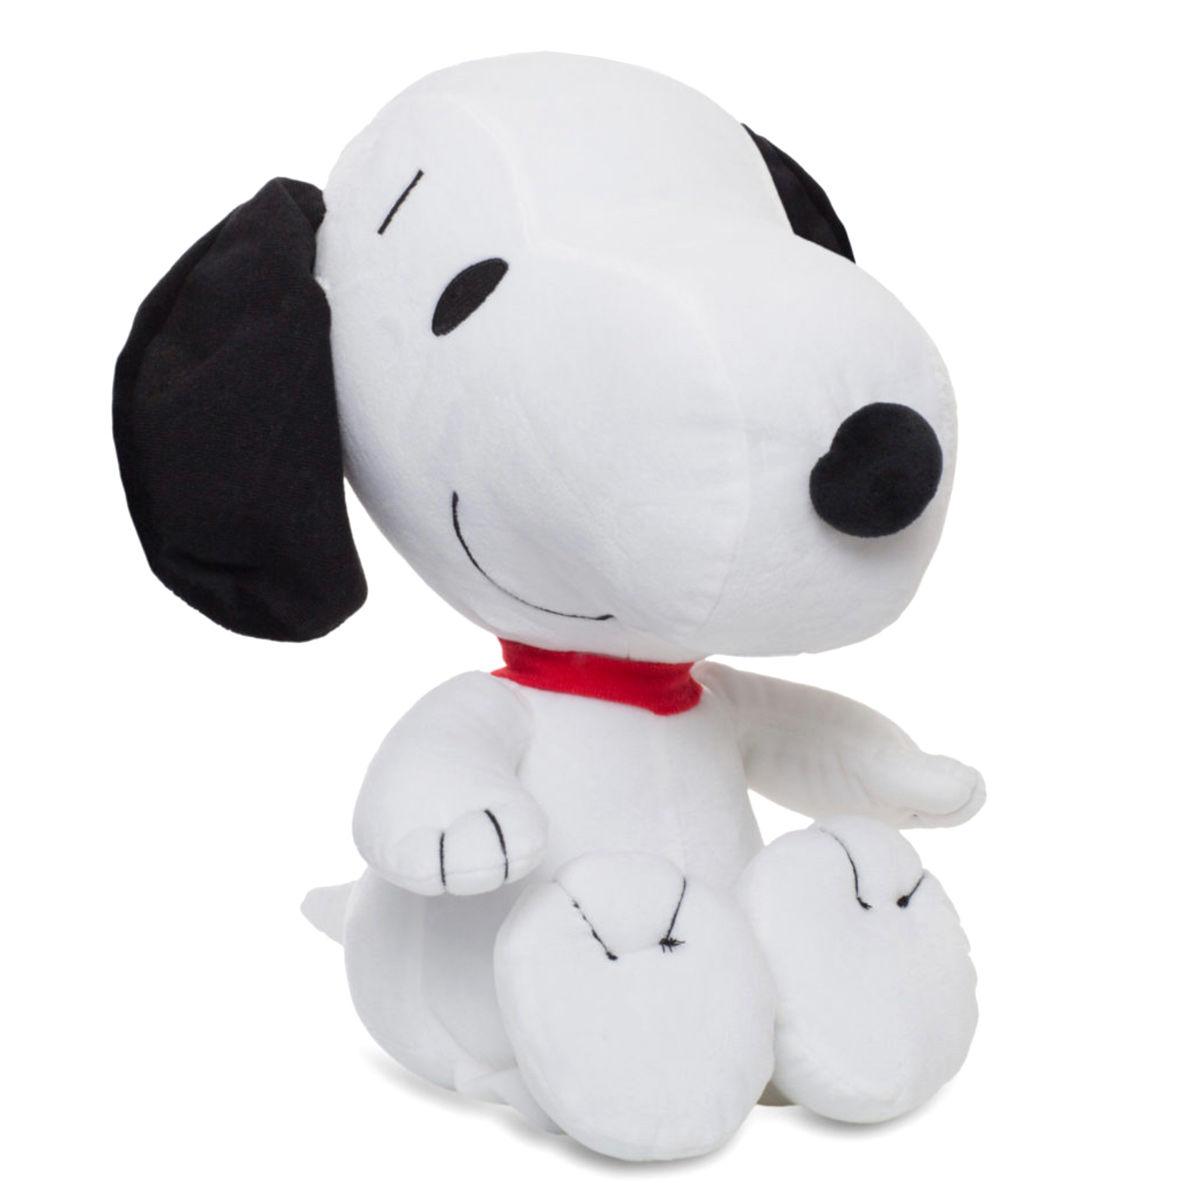 Peluche Snoopy 21cm